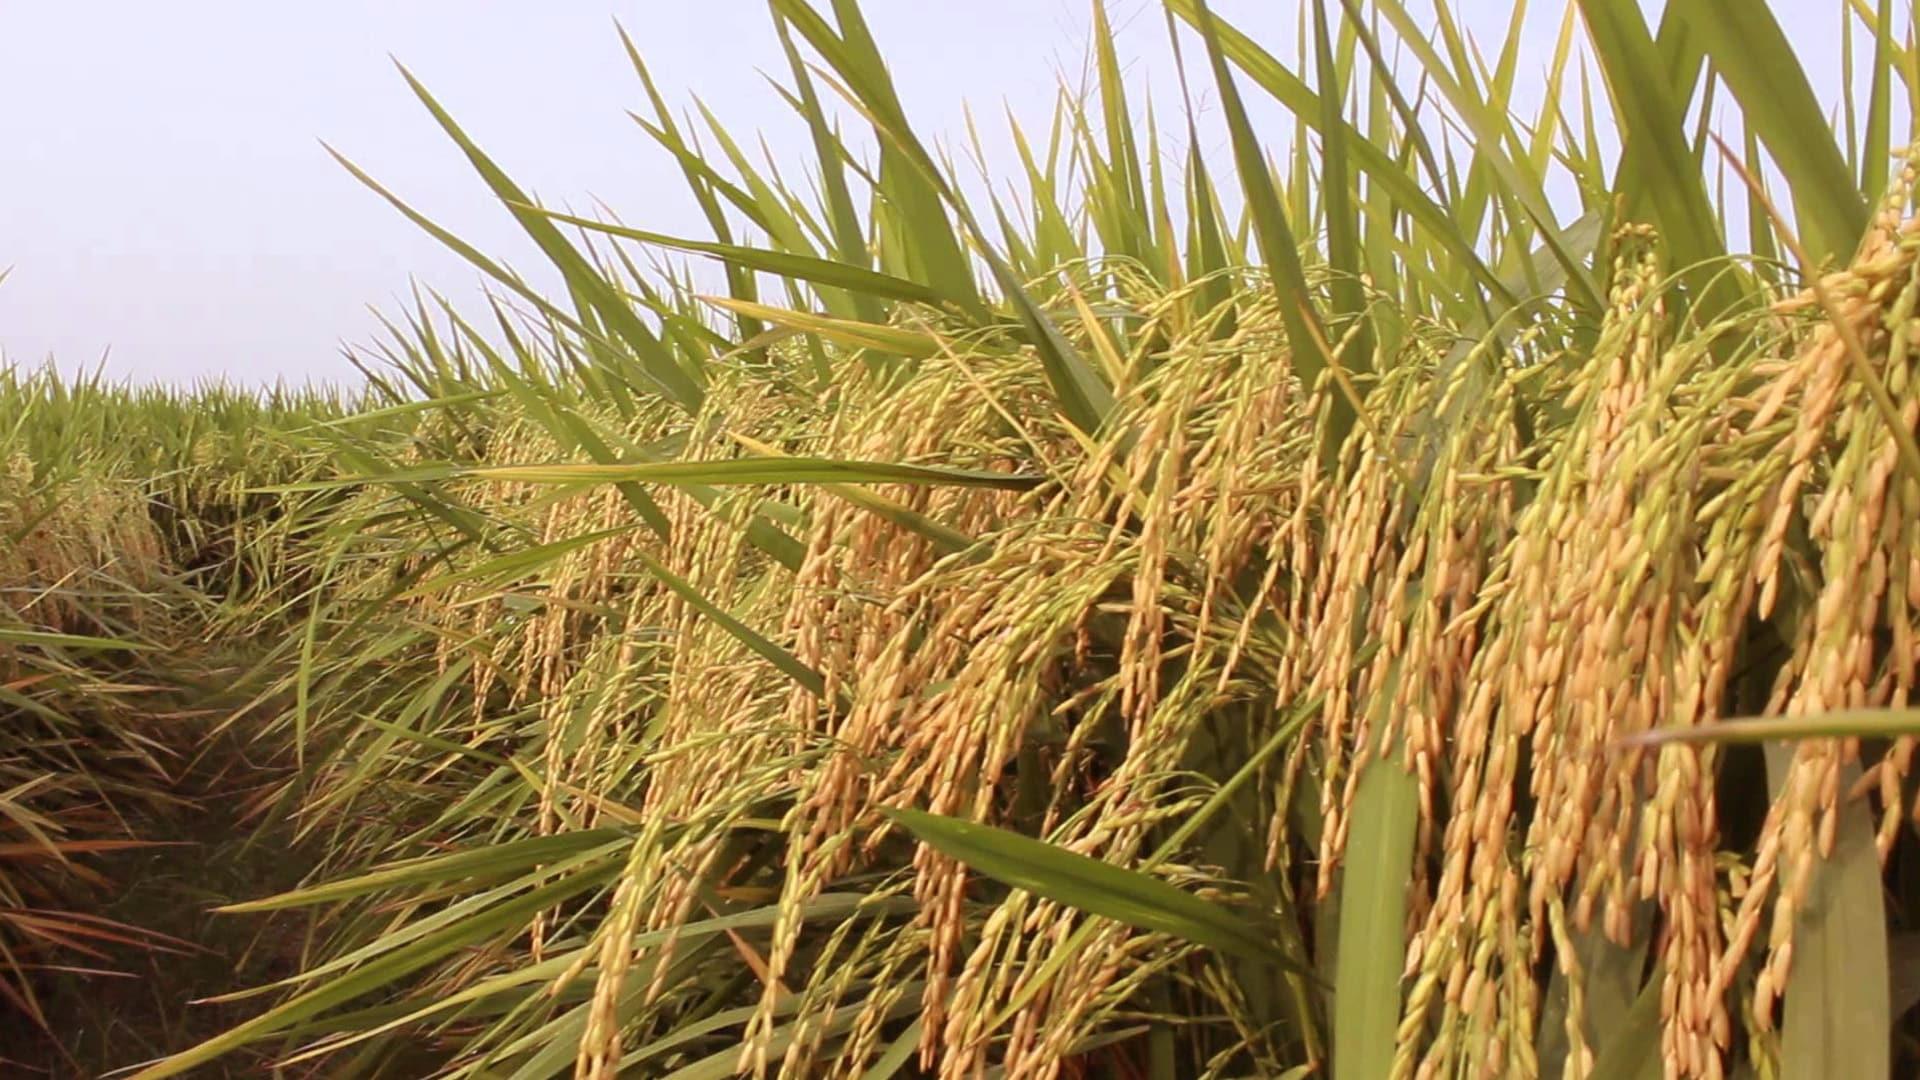 Kharif foodgrain output estimated at record 150.50 million tonne this year: Govt